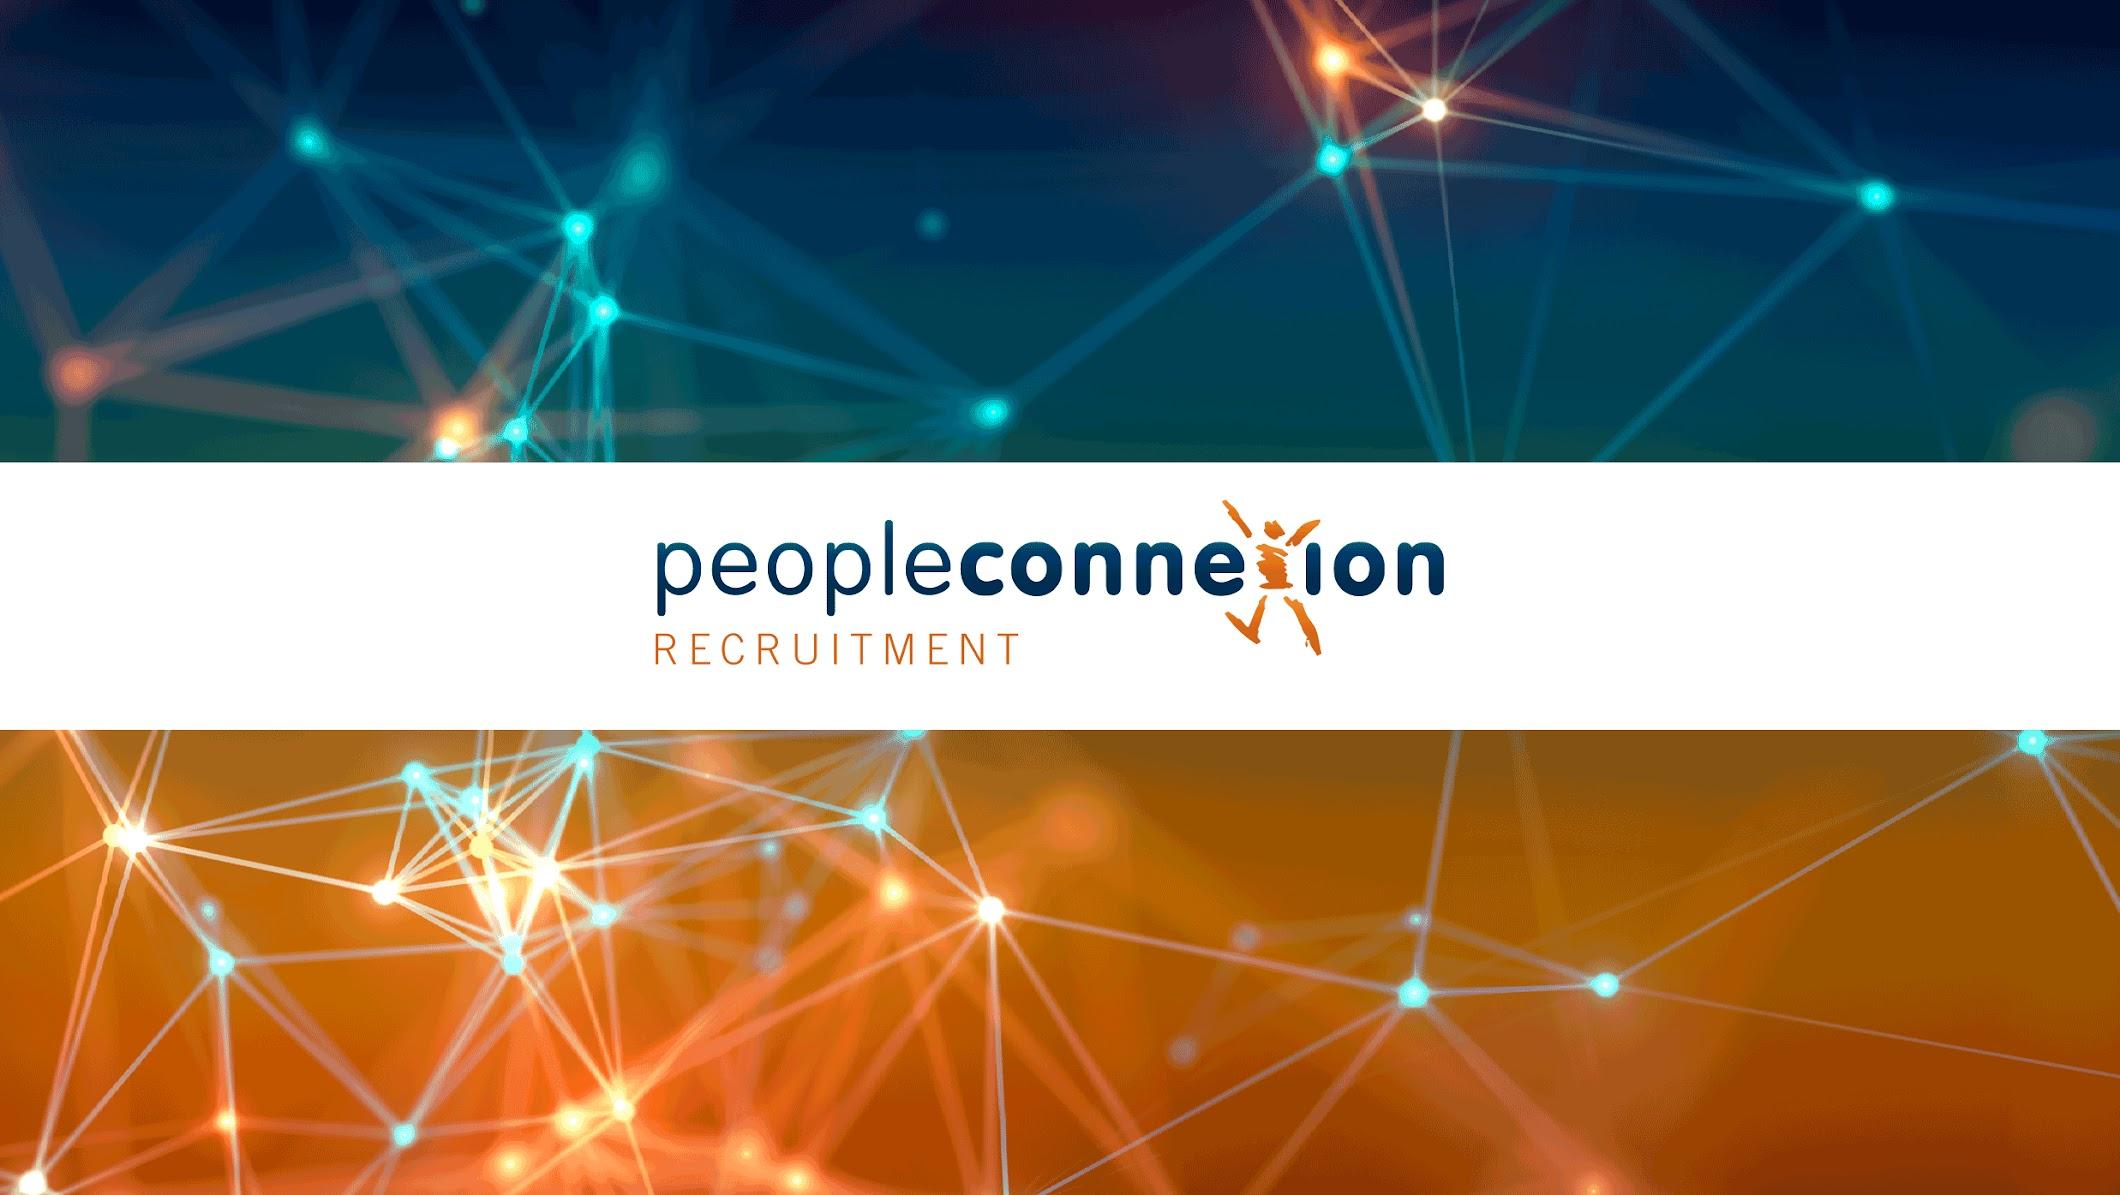 Peopleconnexion.